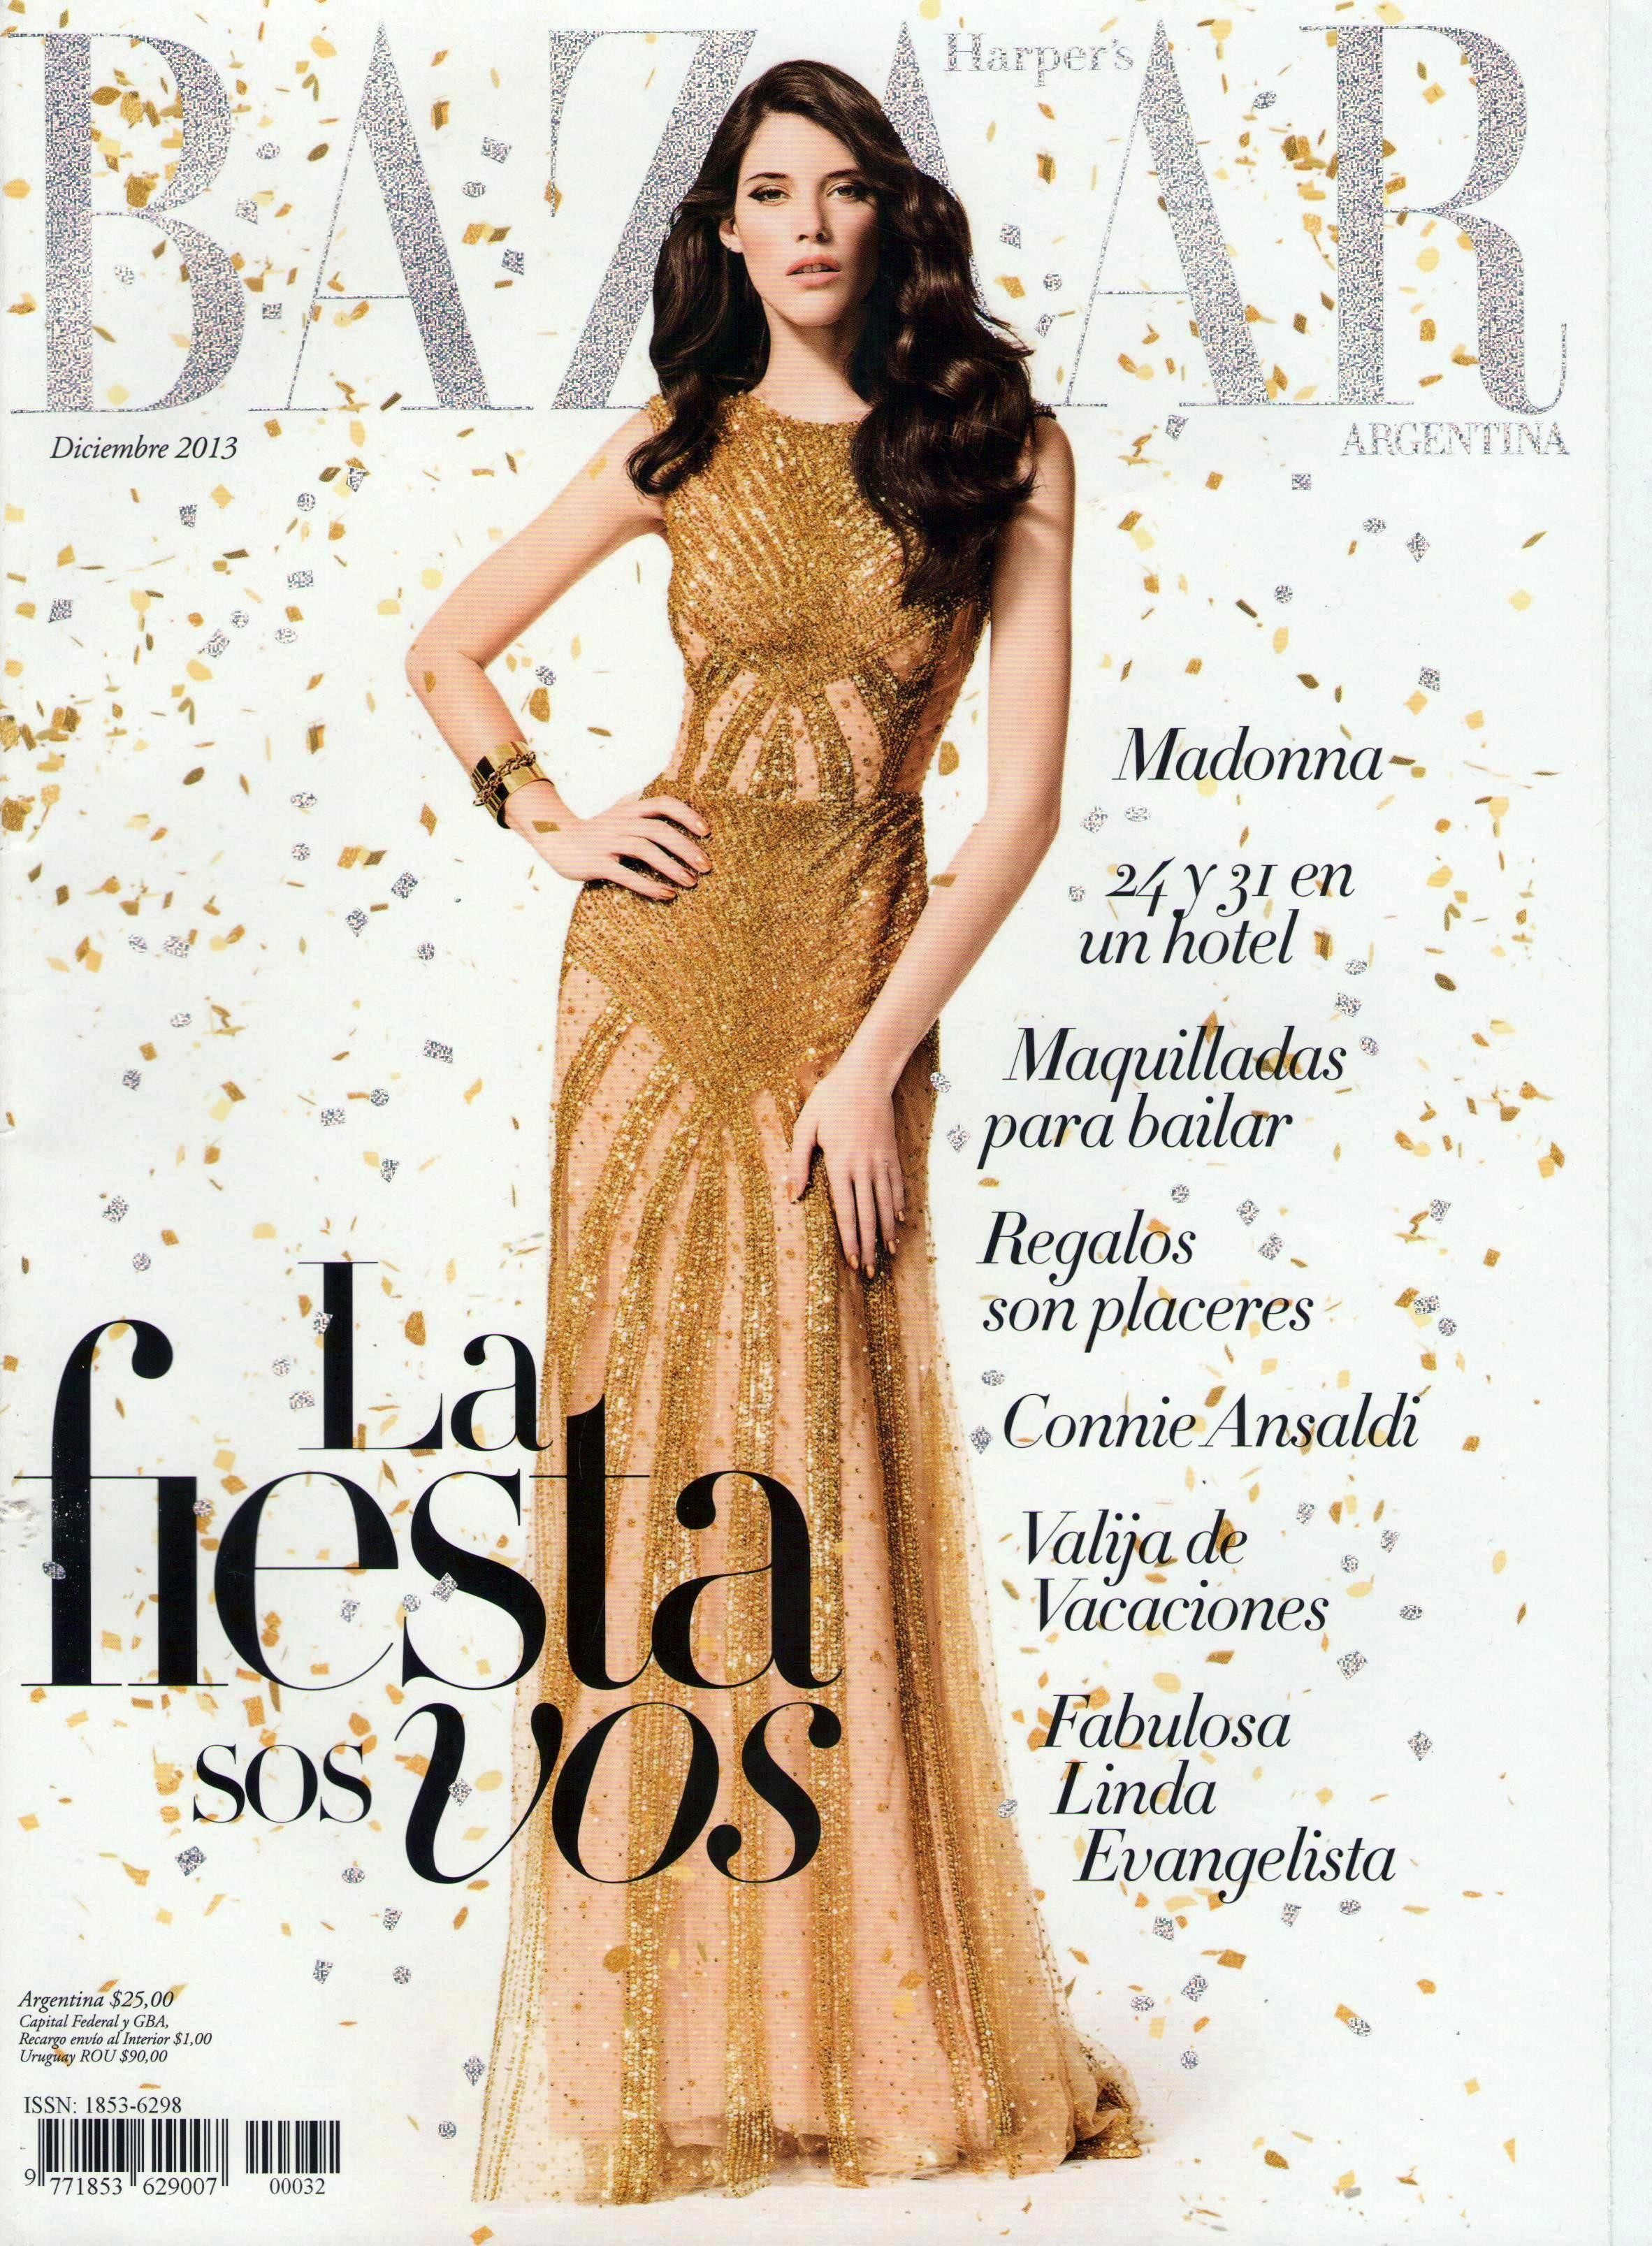 Carla Ciffoni Layers In Fall Knitwear For Elle Uk By: HARPER'S BAZAAR (Argentina)